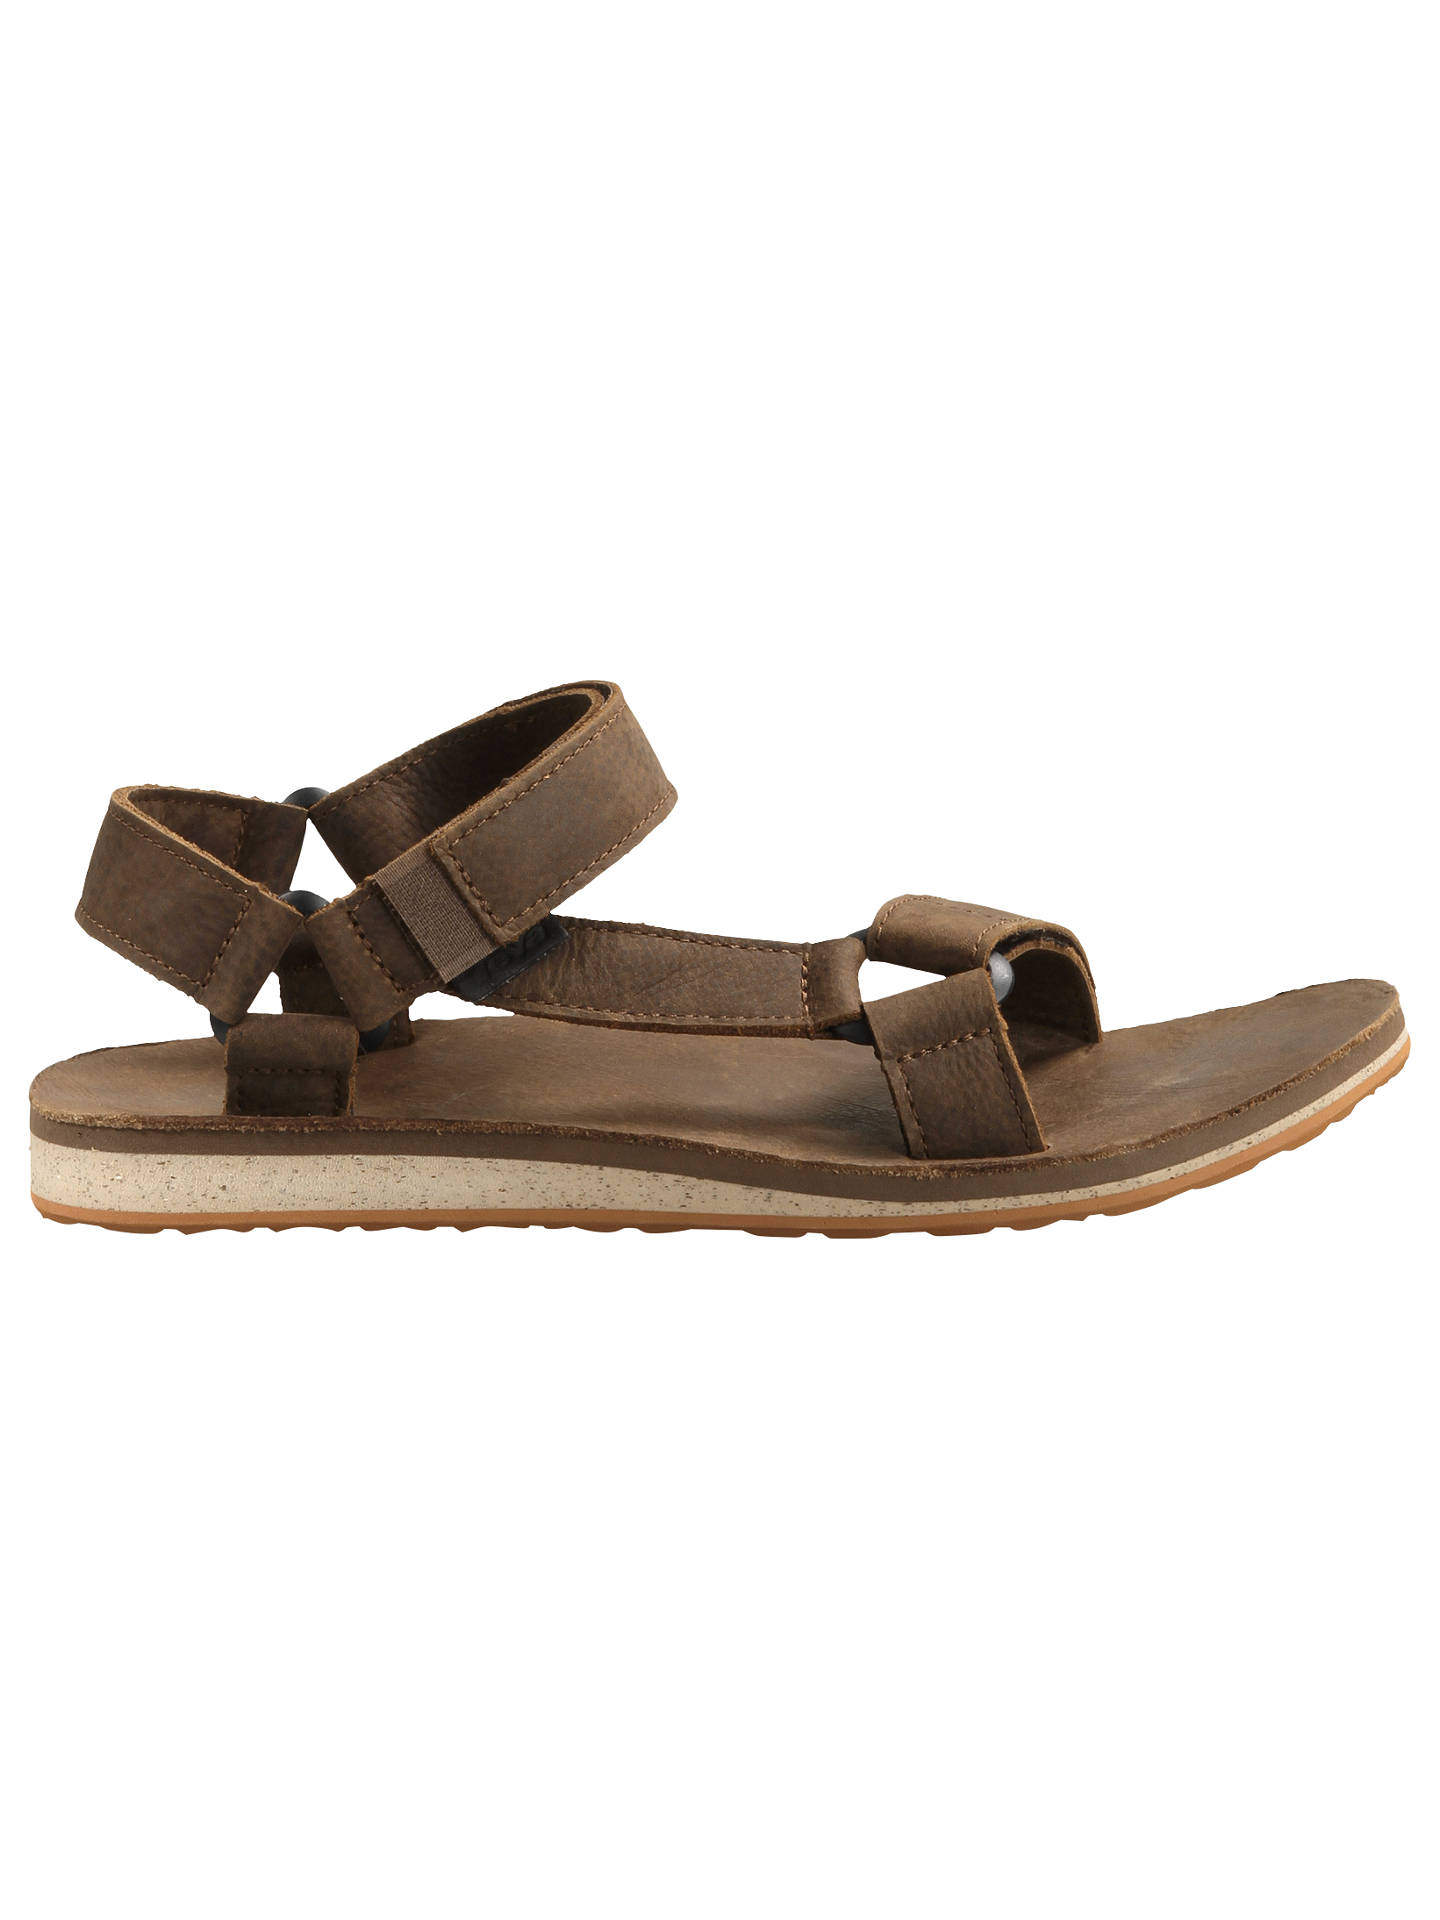 be26d1dd3591 Buy Teva Original Universal Premium Leather Men s Sandals